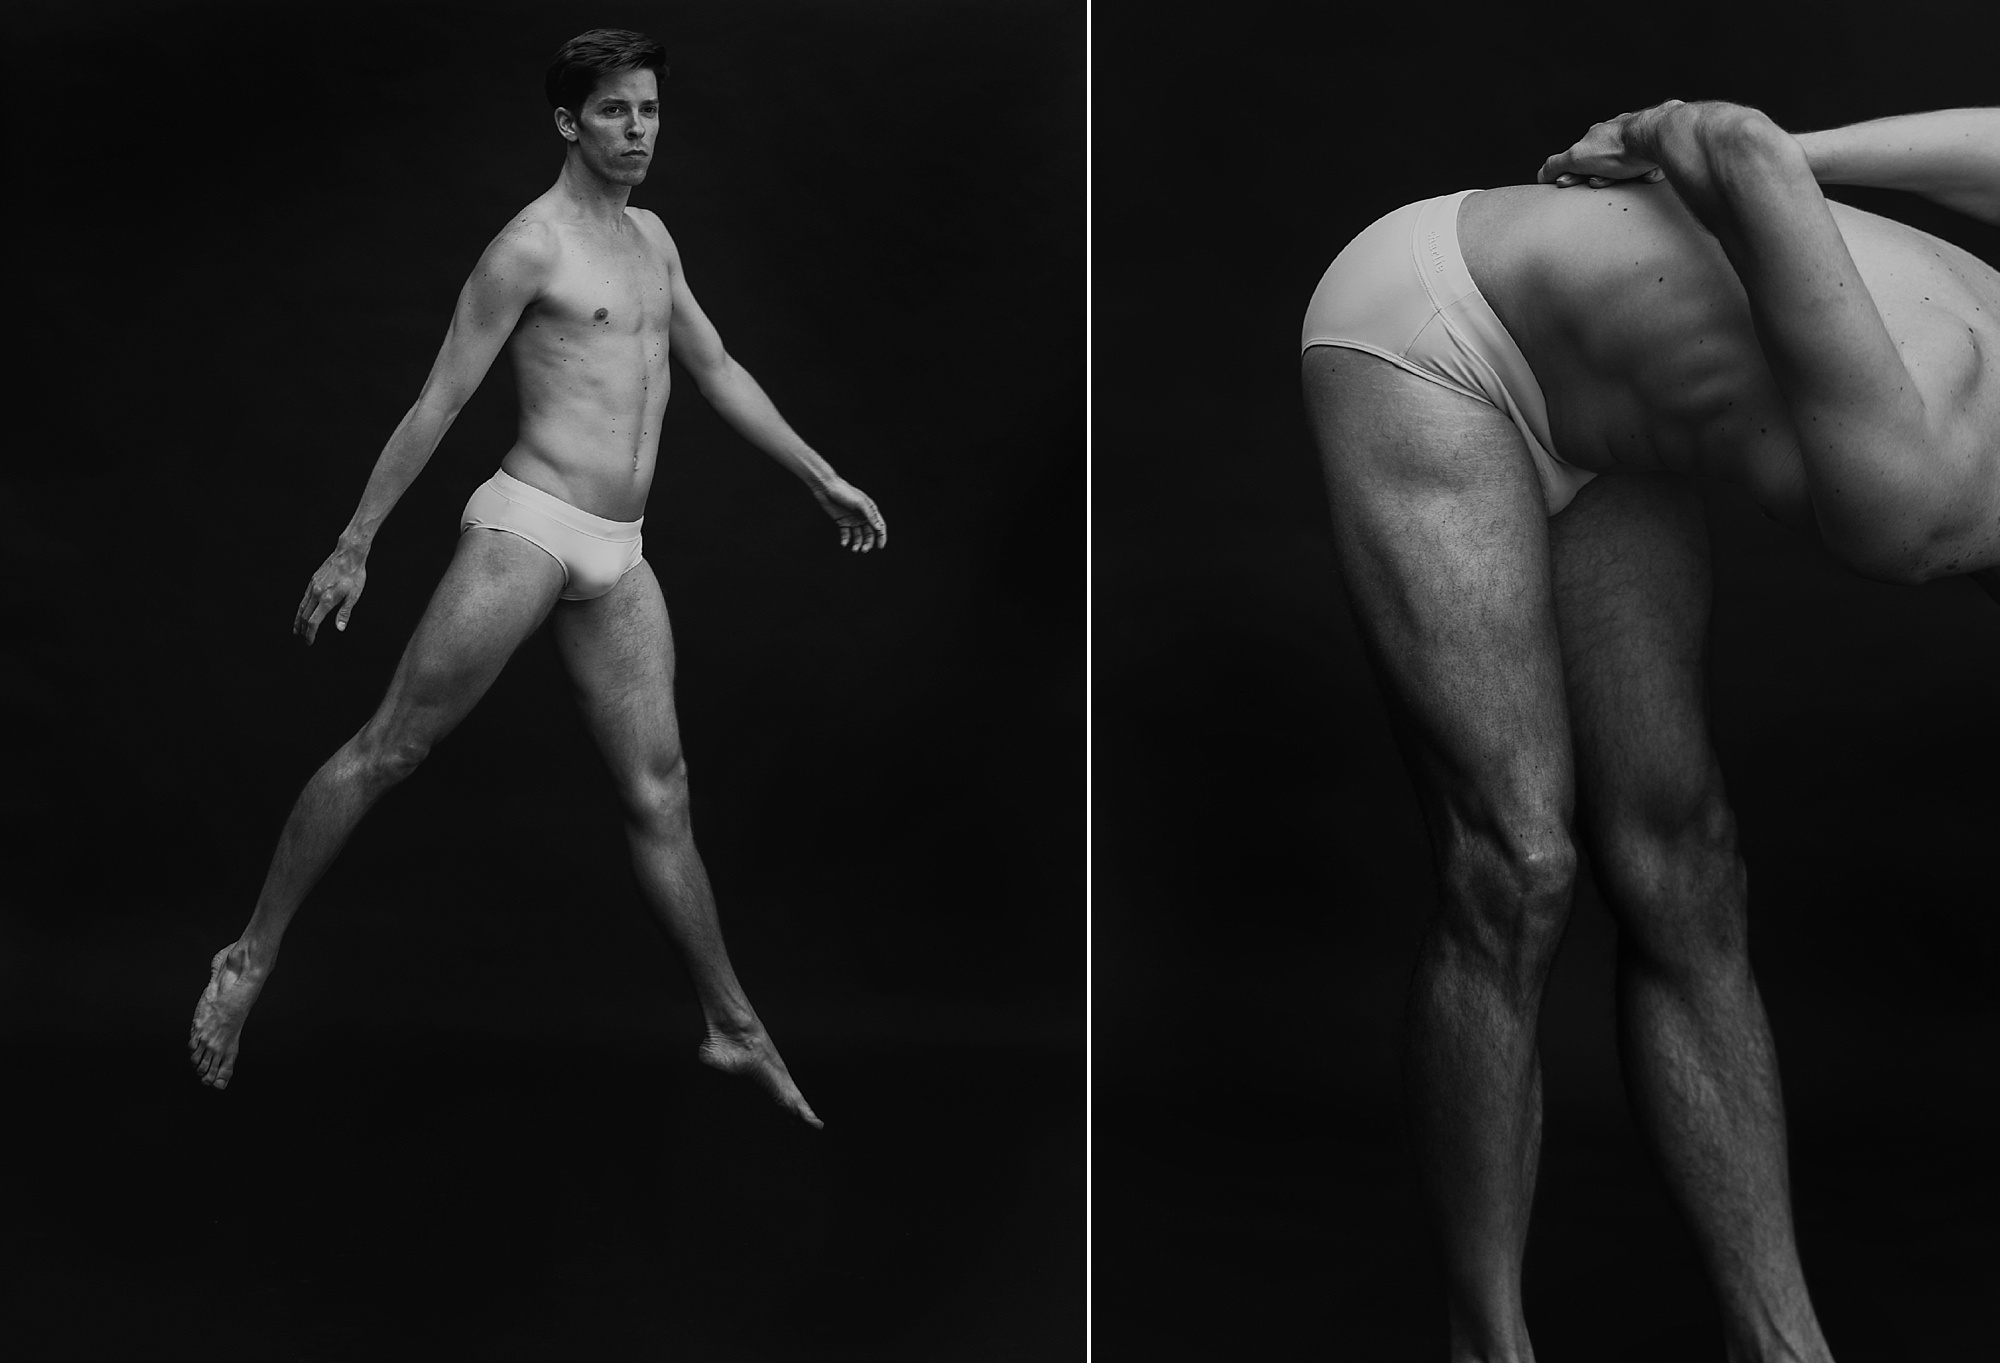 Joe_Mac_Creative_Nude_Portrait_Male_Philadelphia_Chad_Sapp__0049.jpg